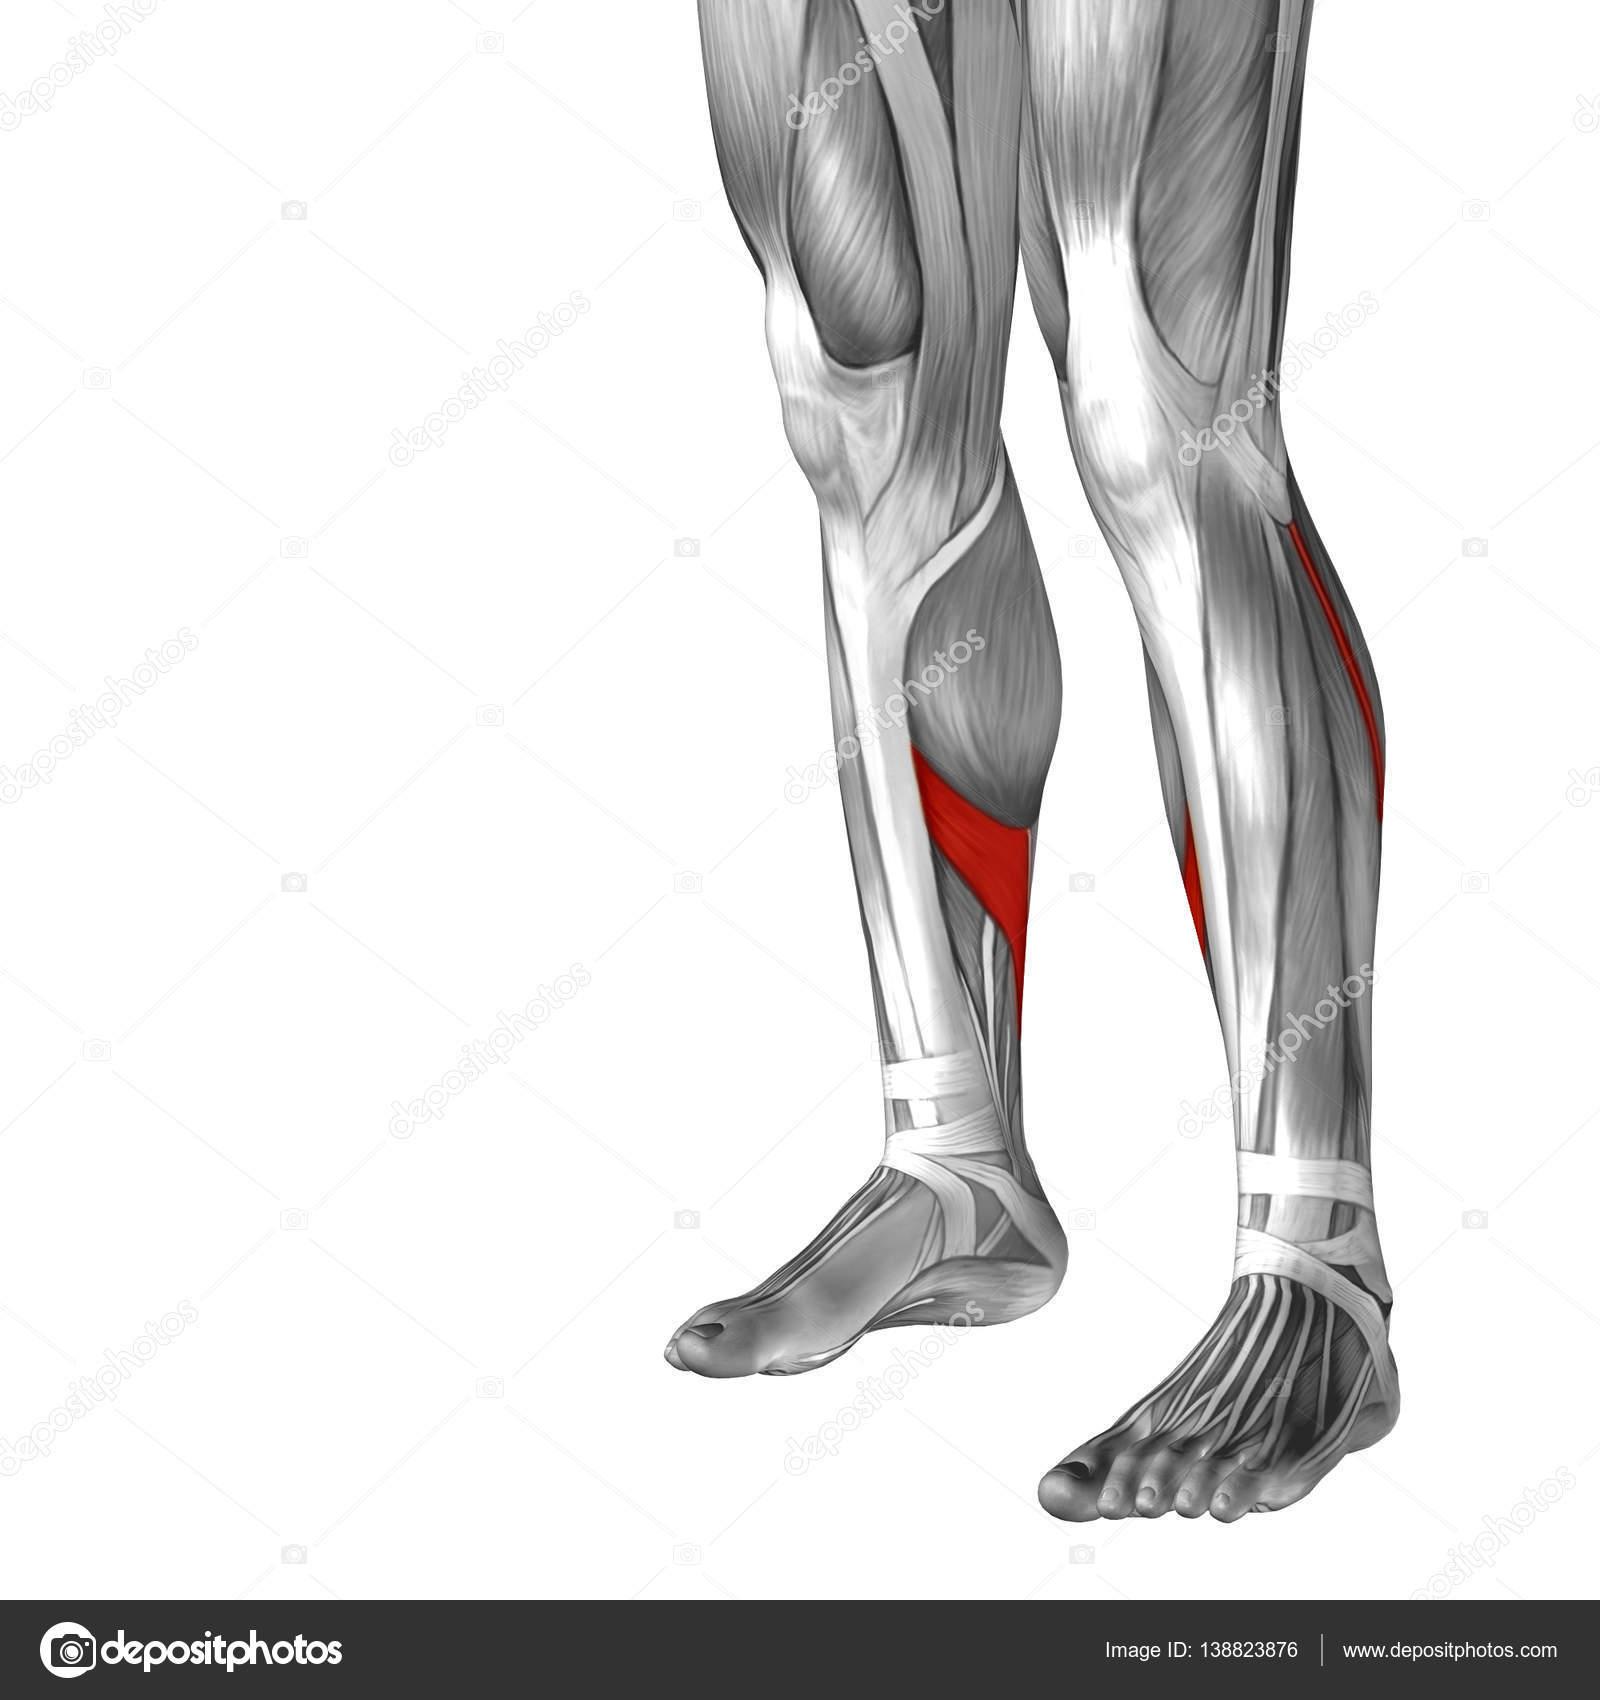 Human Lower Leg Anatomy Stock Photo Design36 138823876